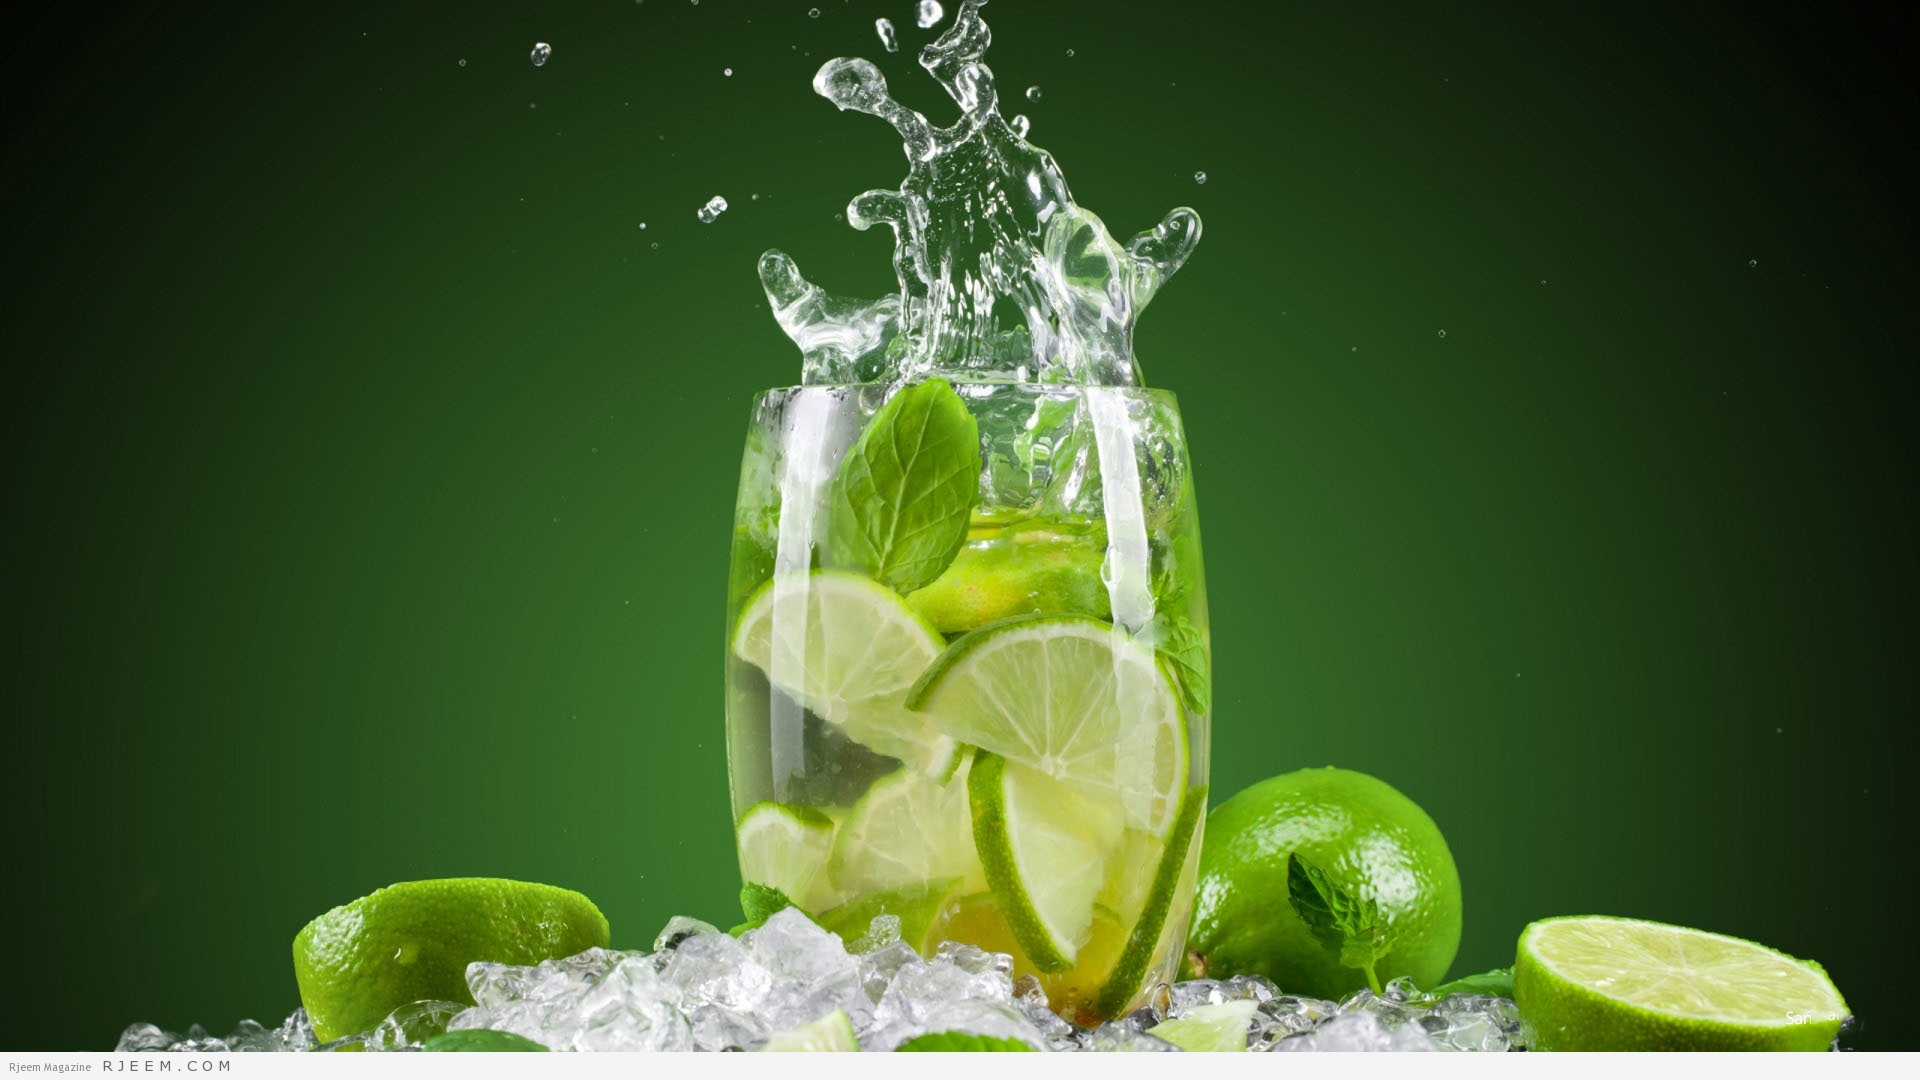 Photo of 3 مشروبات أكثر فعالية من ماء الليمون لخسارة الوزن.. اكتشفيها